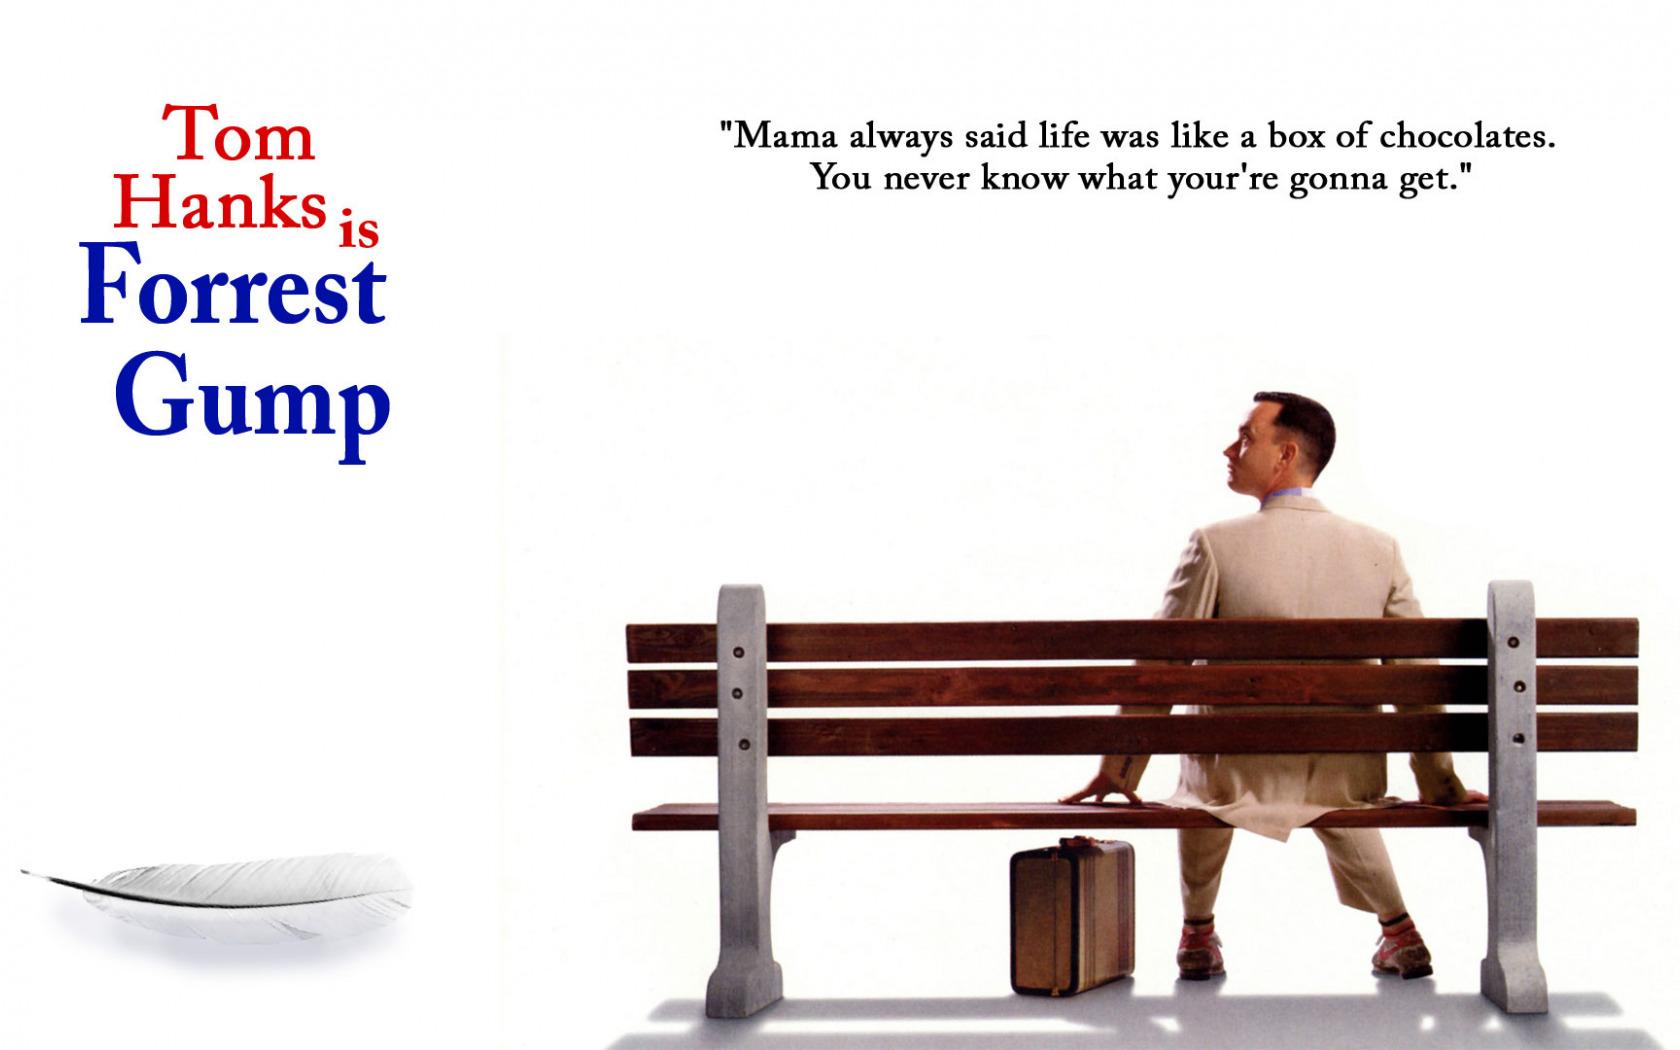 personal response forrest gump film essay